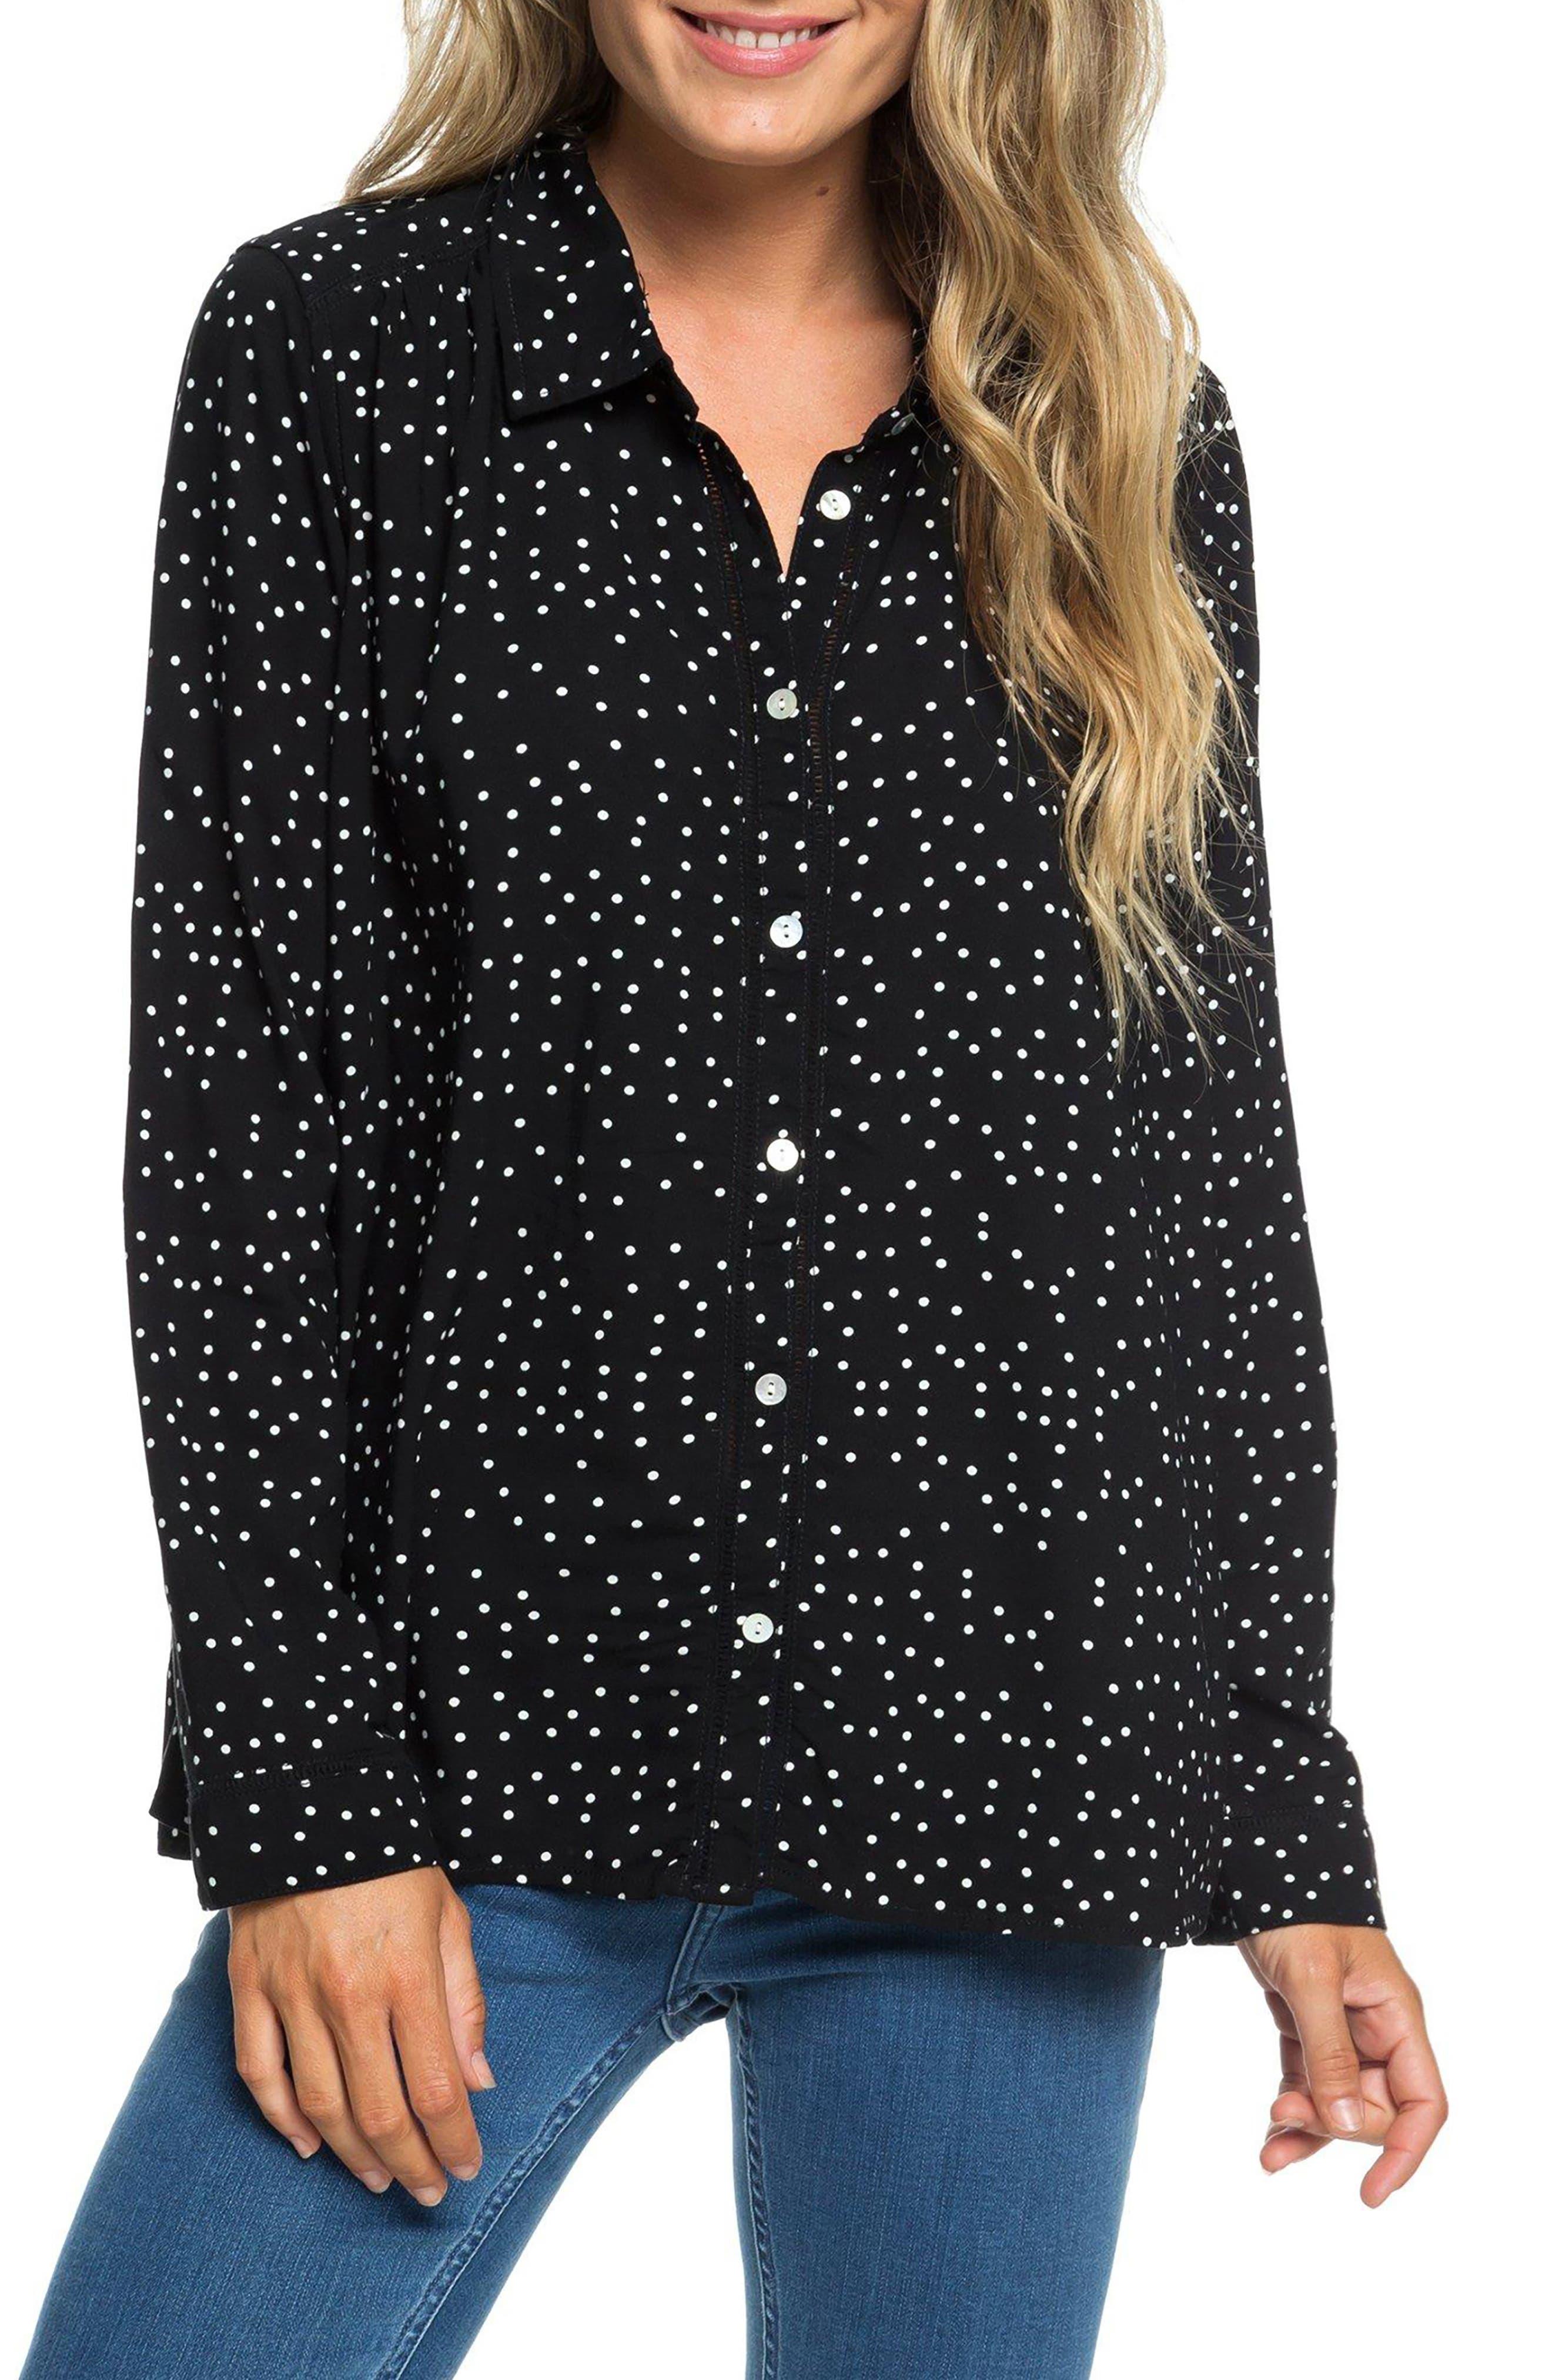 Urban Earth Polka Dot Shirt,                             Main thumbnail 1, color,                             TRUE BLACK DOTS FOR DAYS